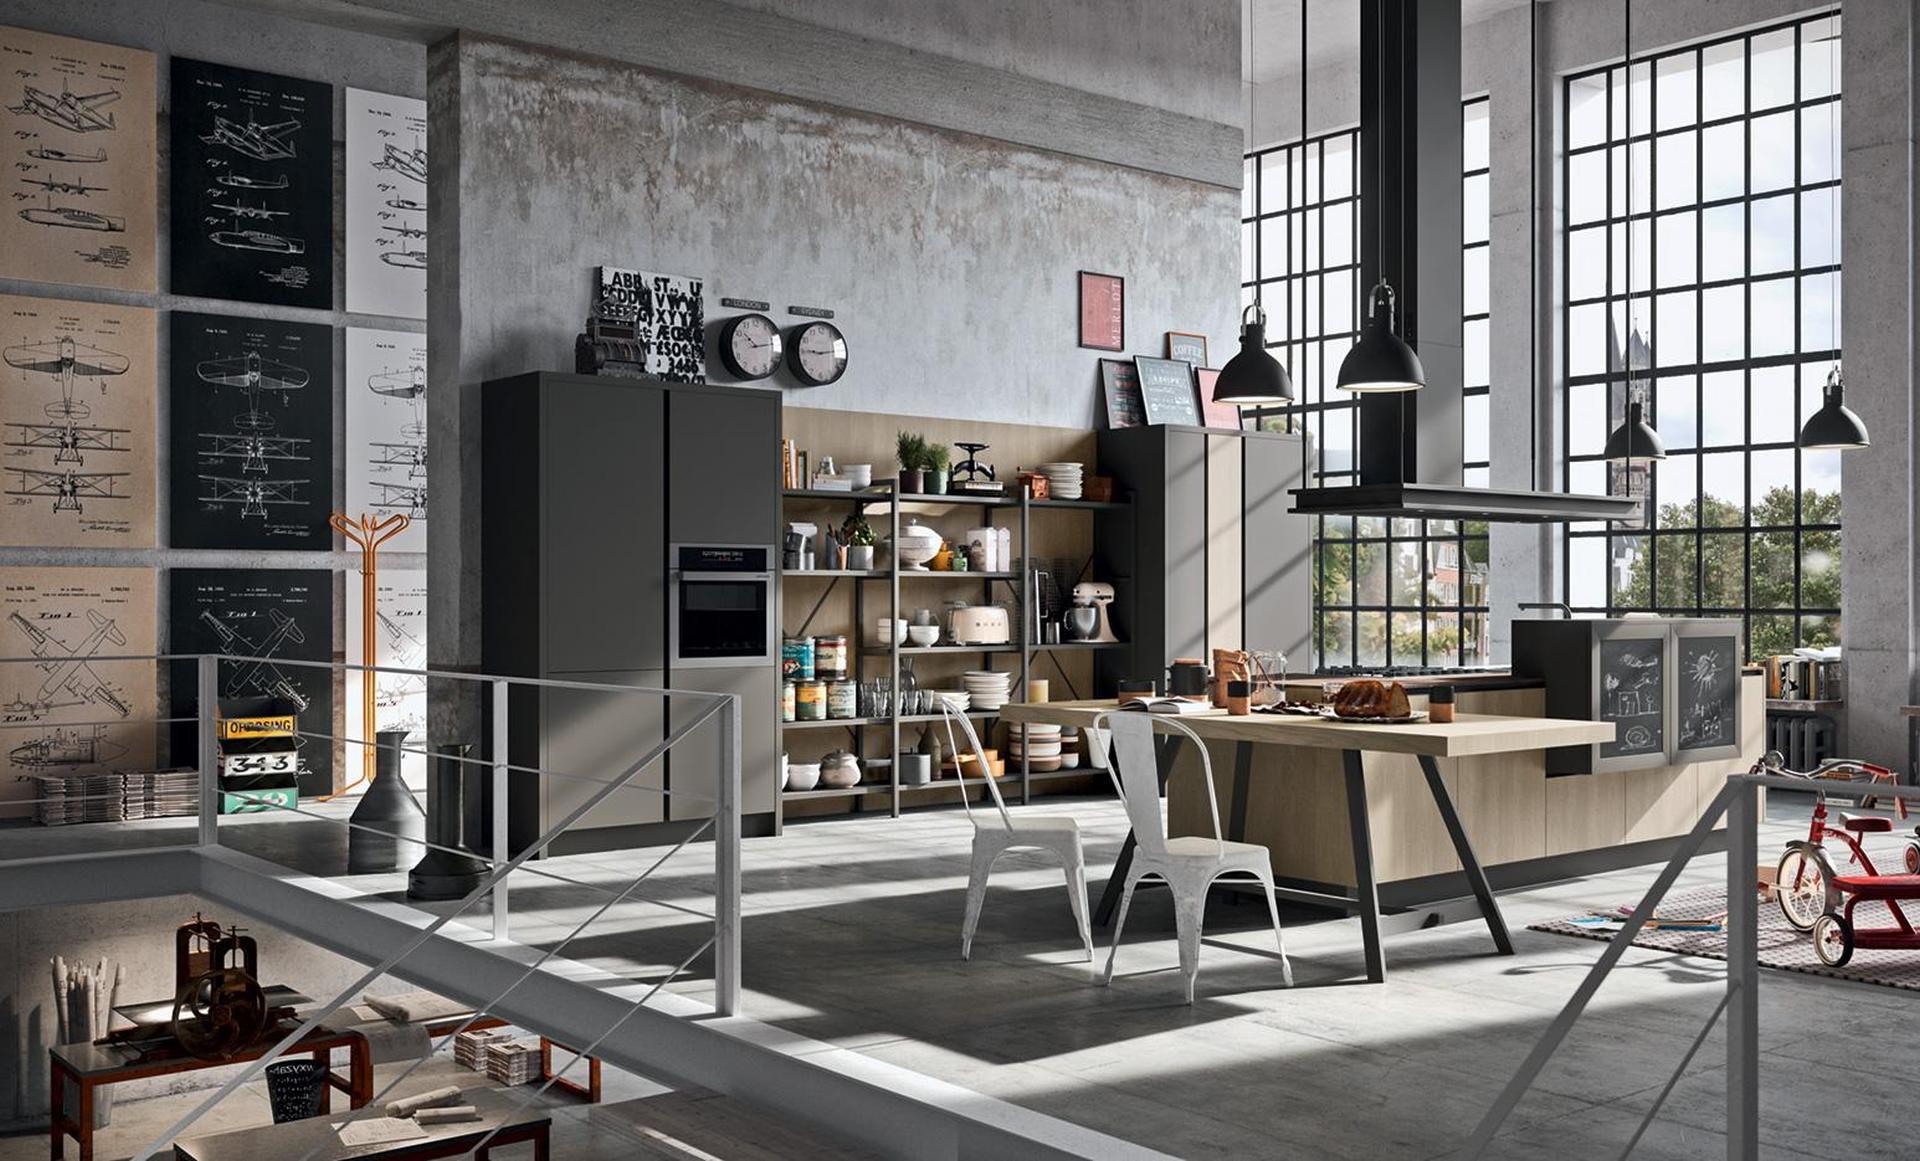 Cucine industrial arredamenti riuniti for Interior design cucine